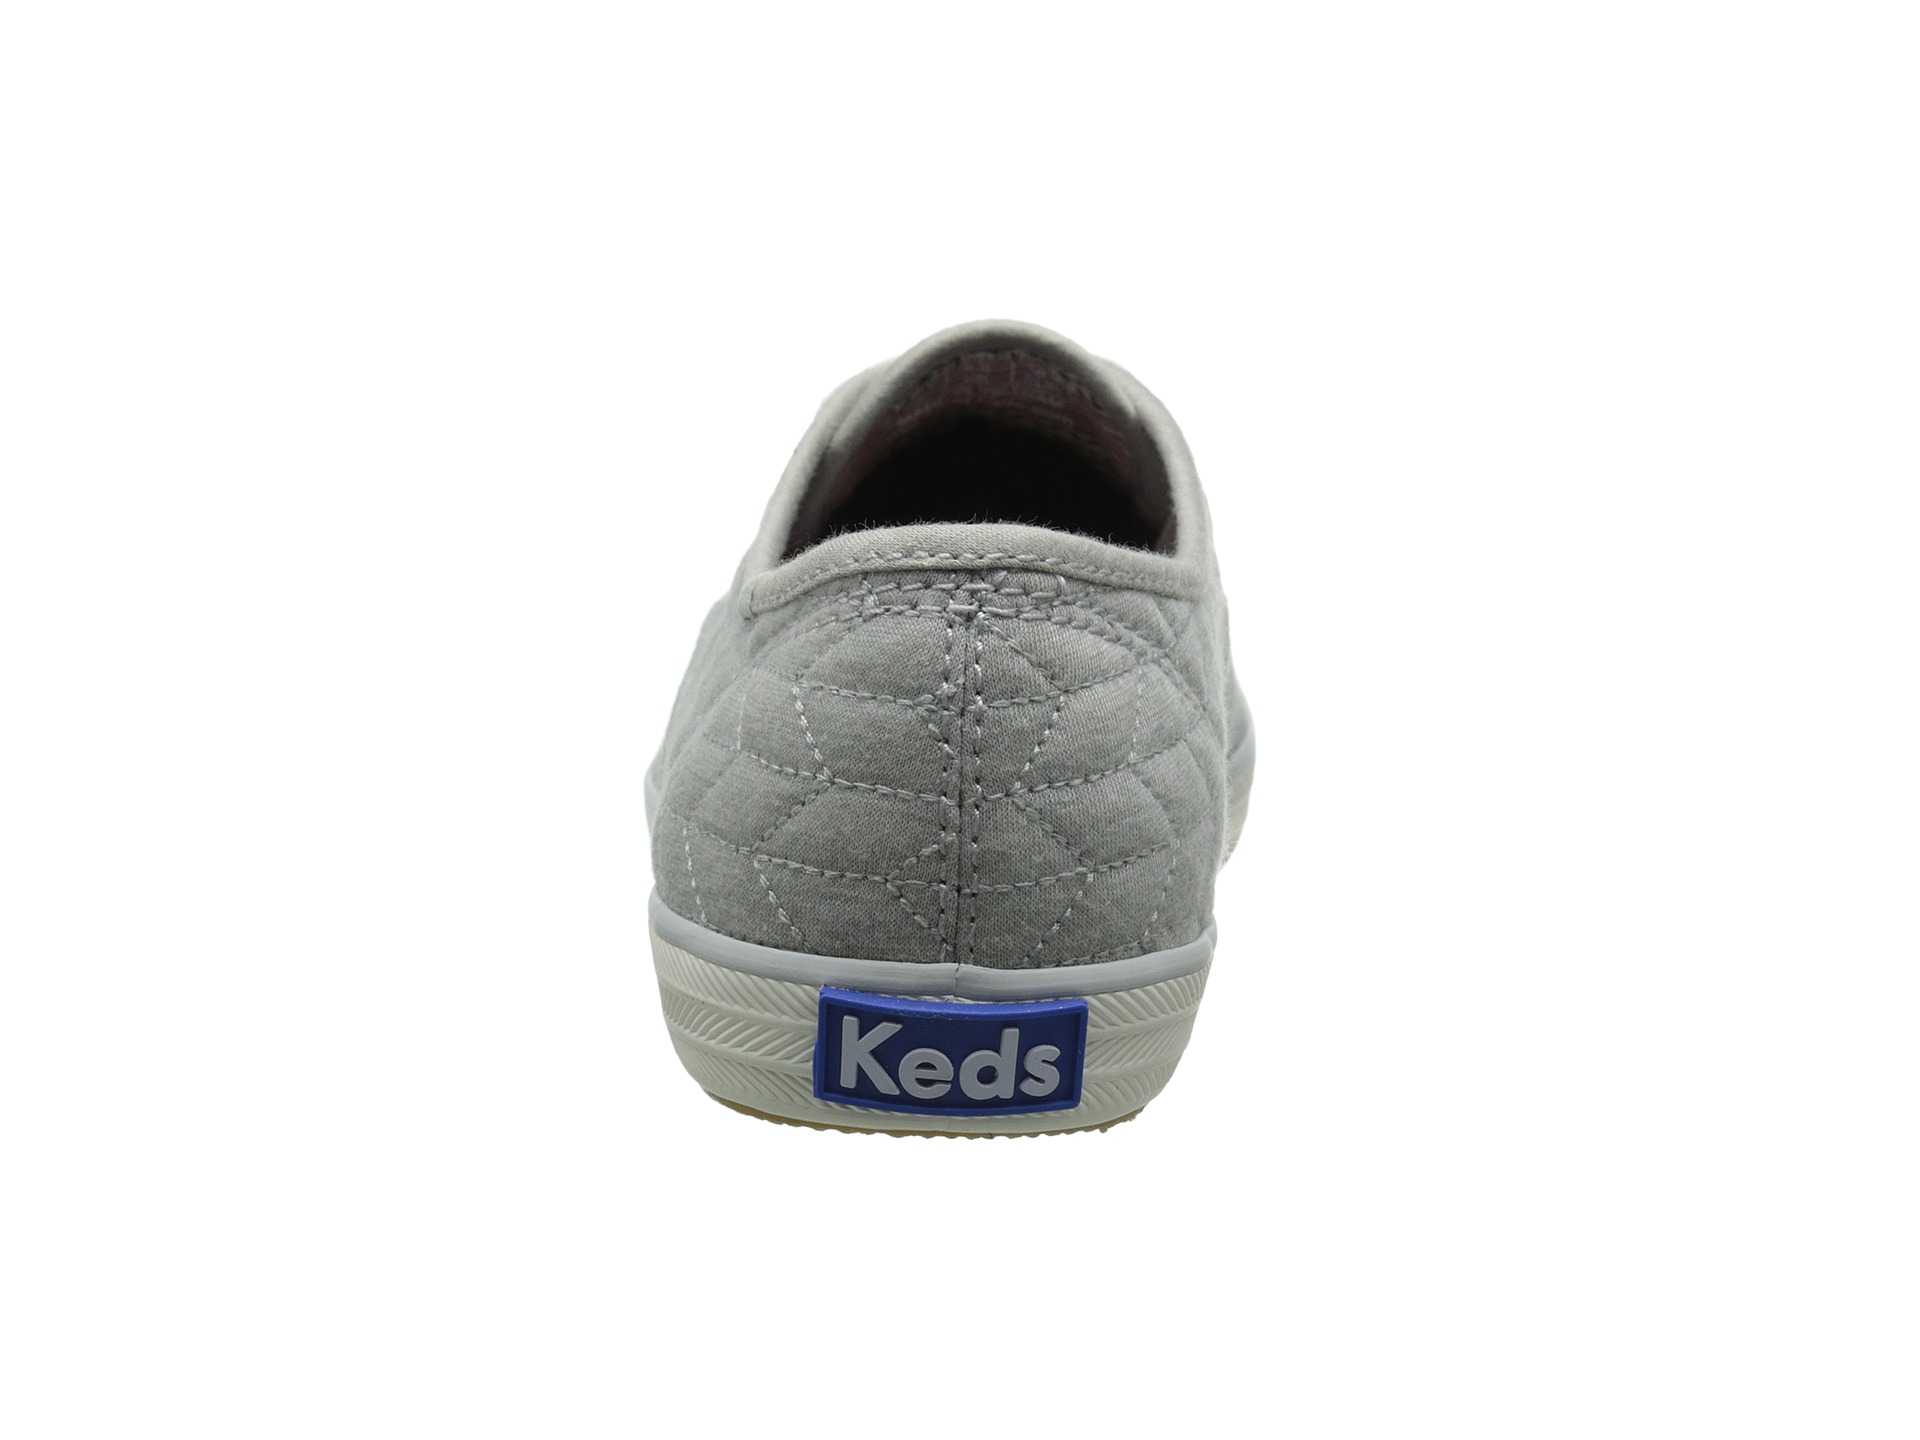 keds champion leather cvo sale